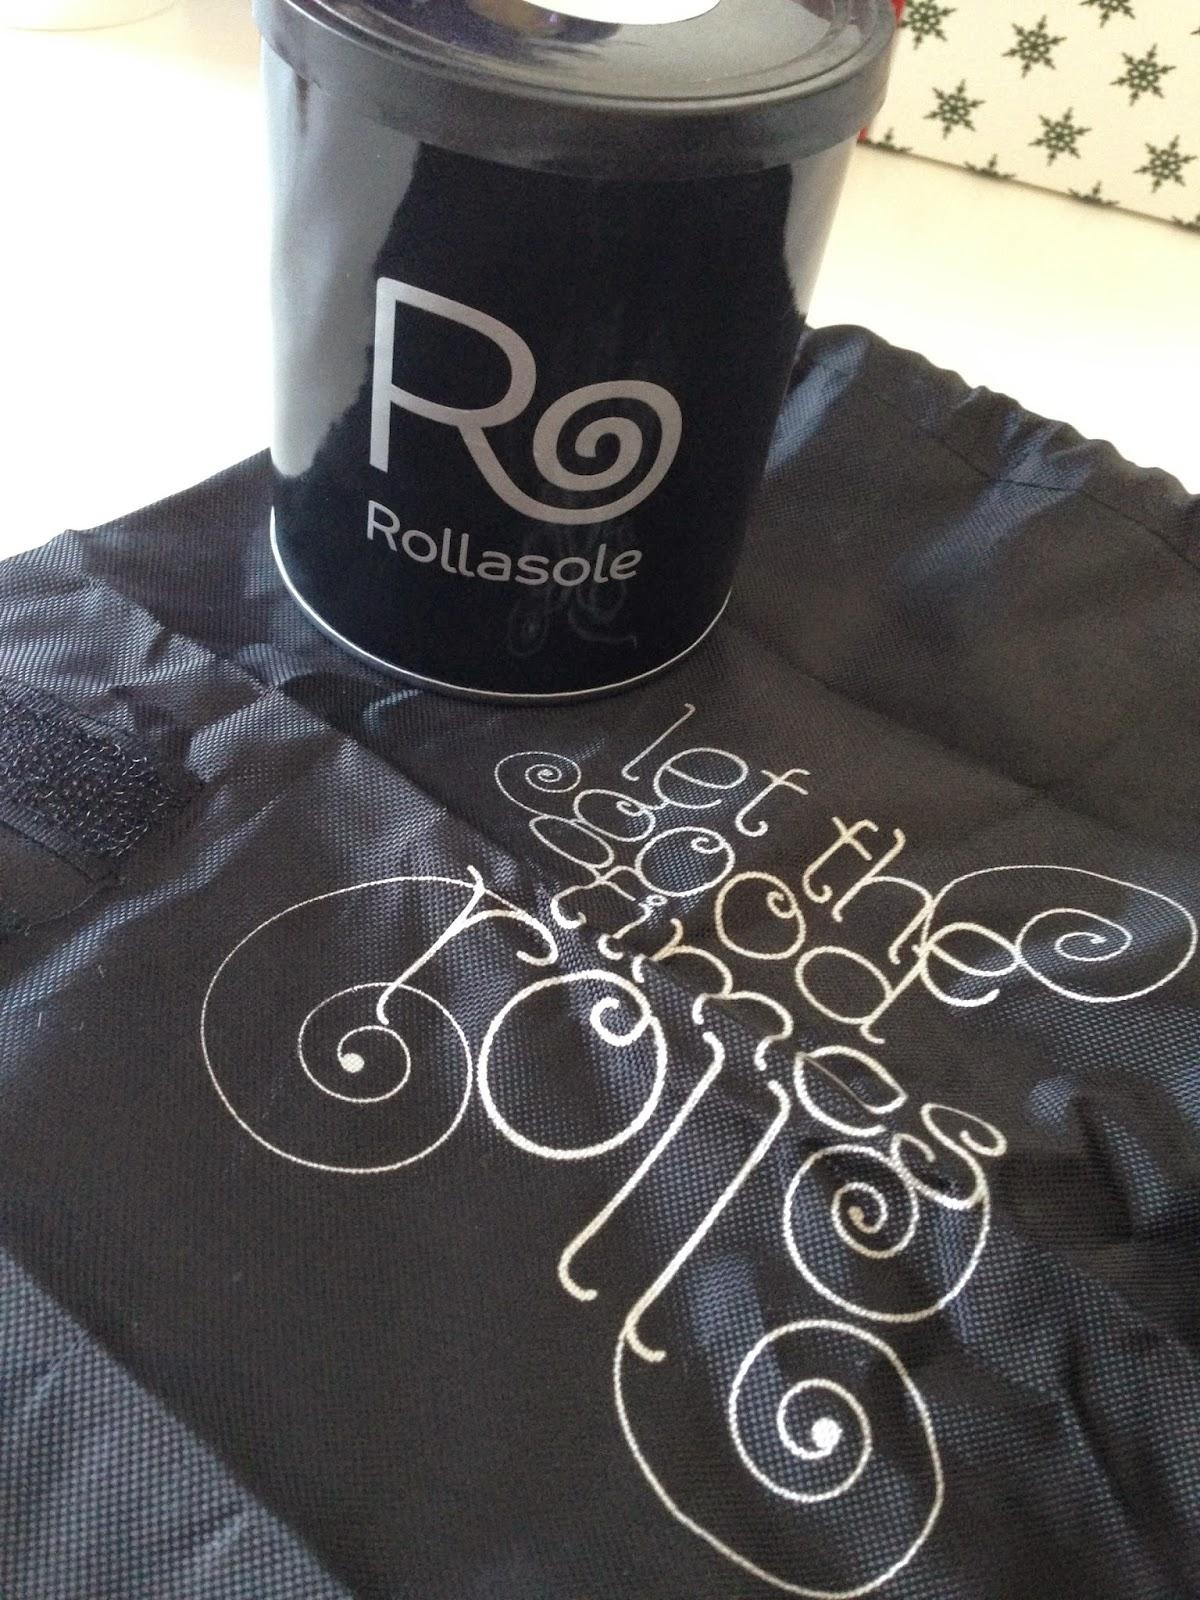 rollashoe